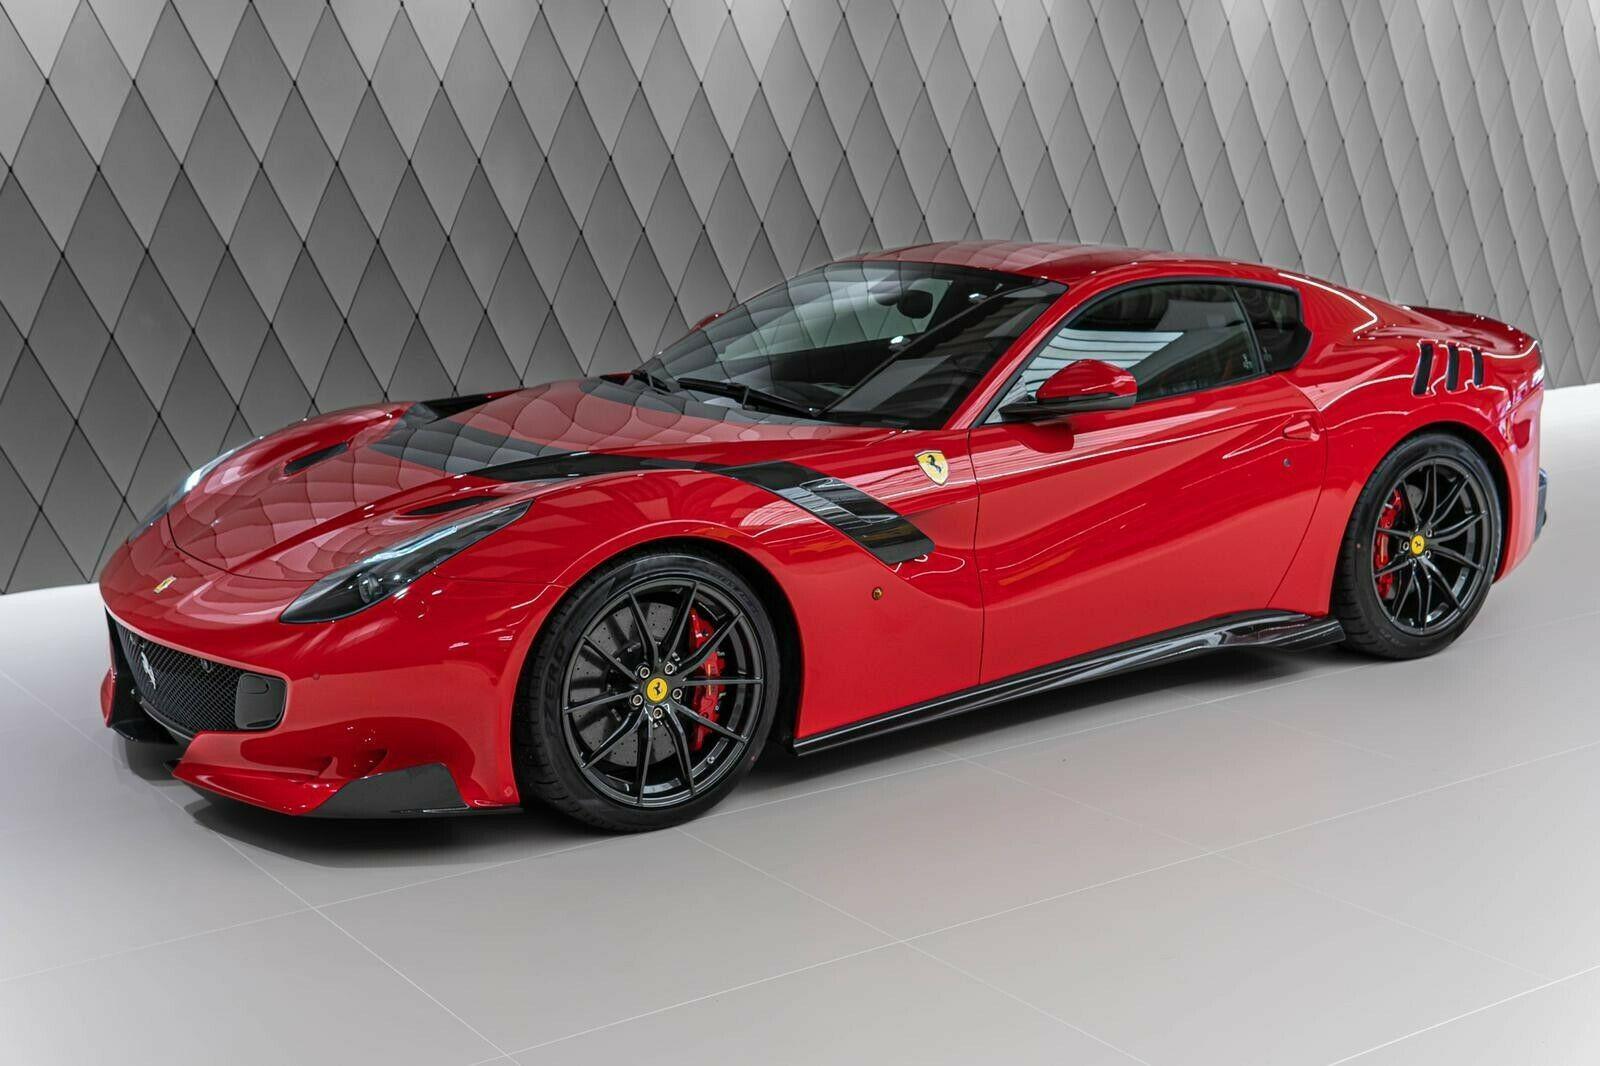 For Sale Ferrari F12 Tdf Luxury Cars Hamburg Germany For Sale On Luxurypulse Ferrari F12 Tdf Ferrari F12 Luxury Cars